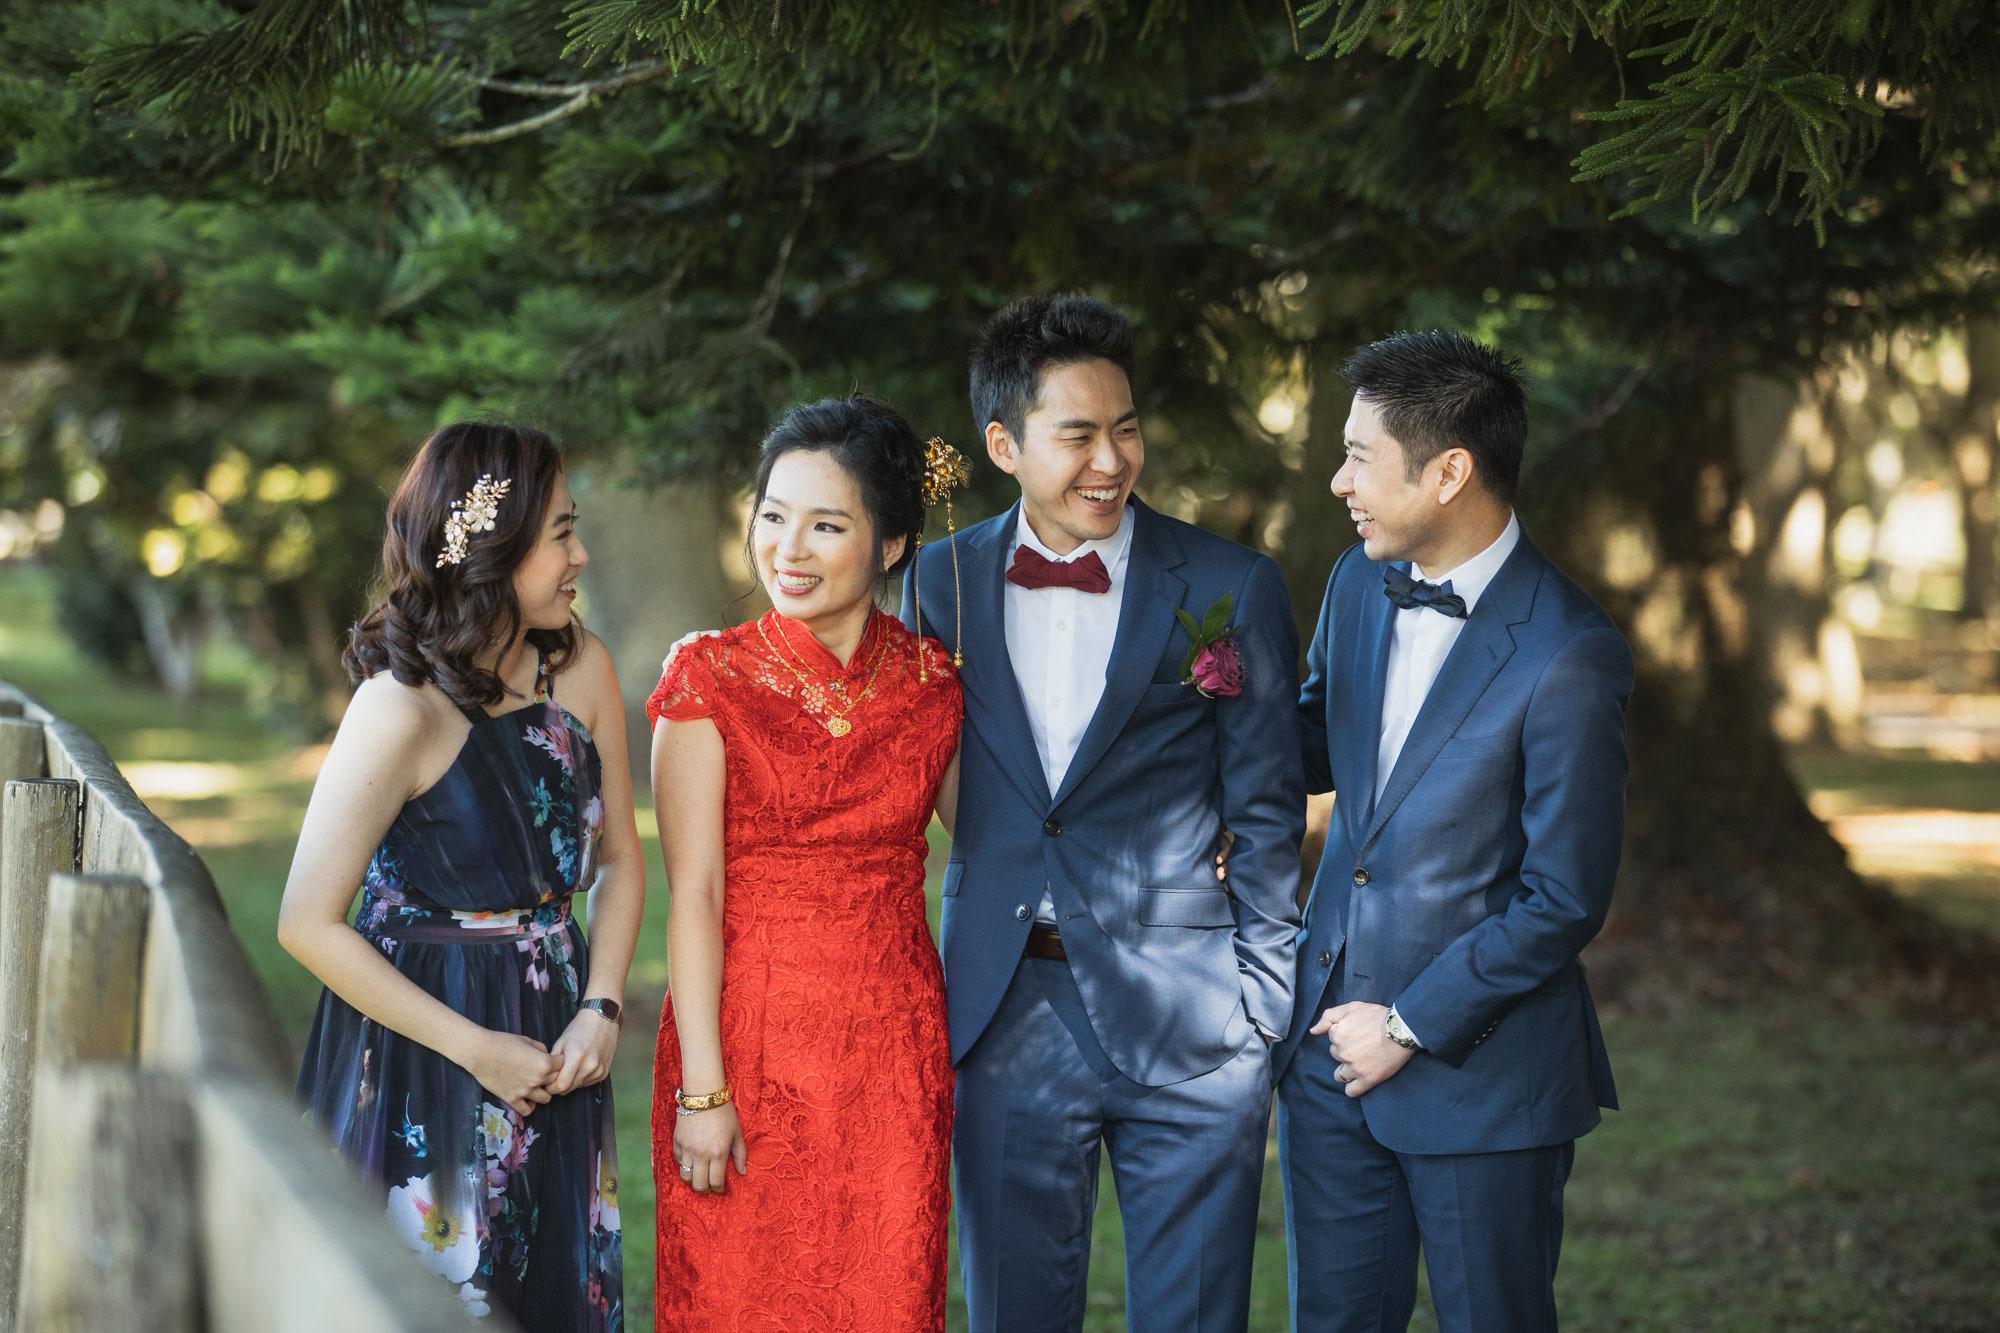 auckland wedding party photo